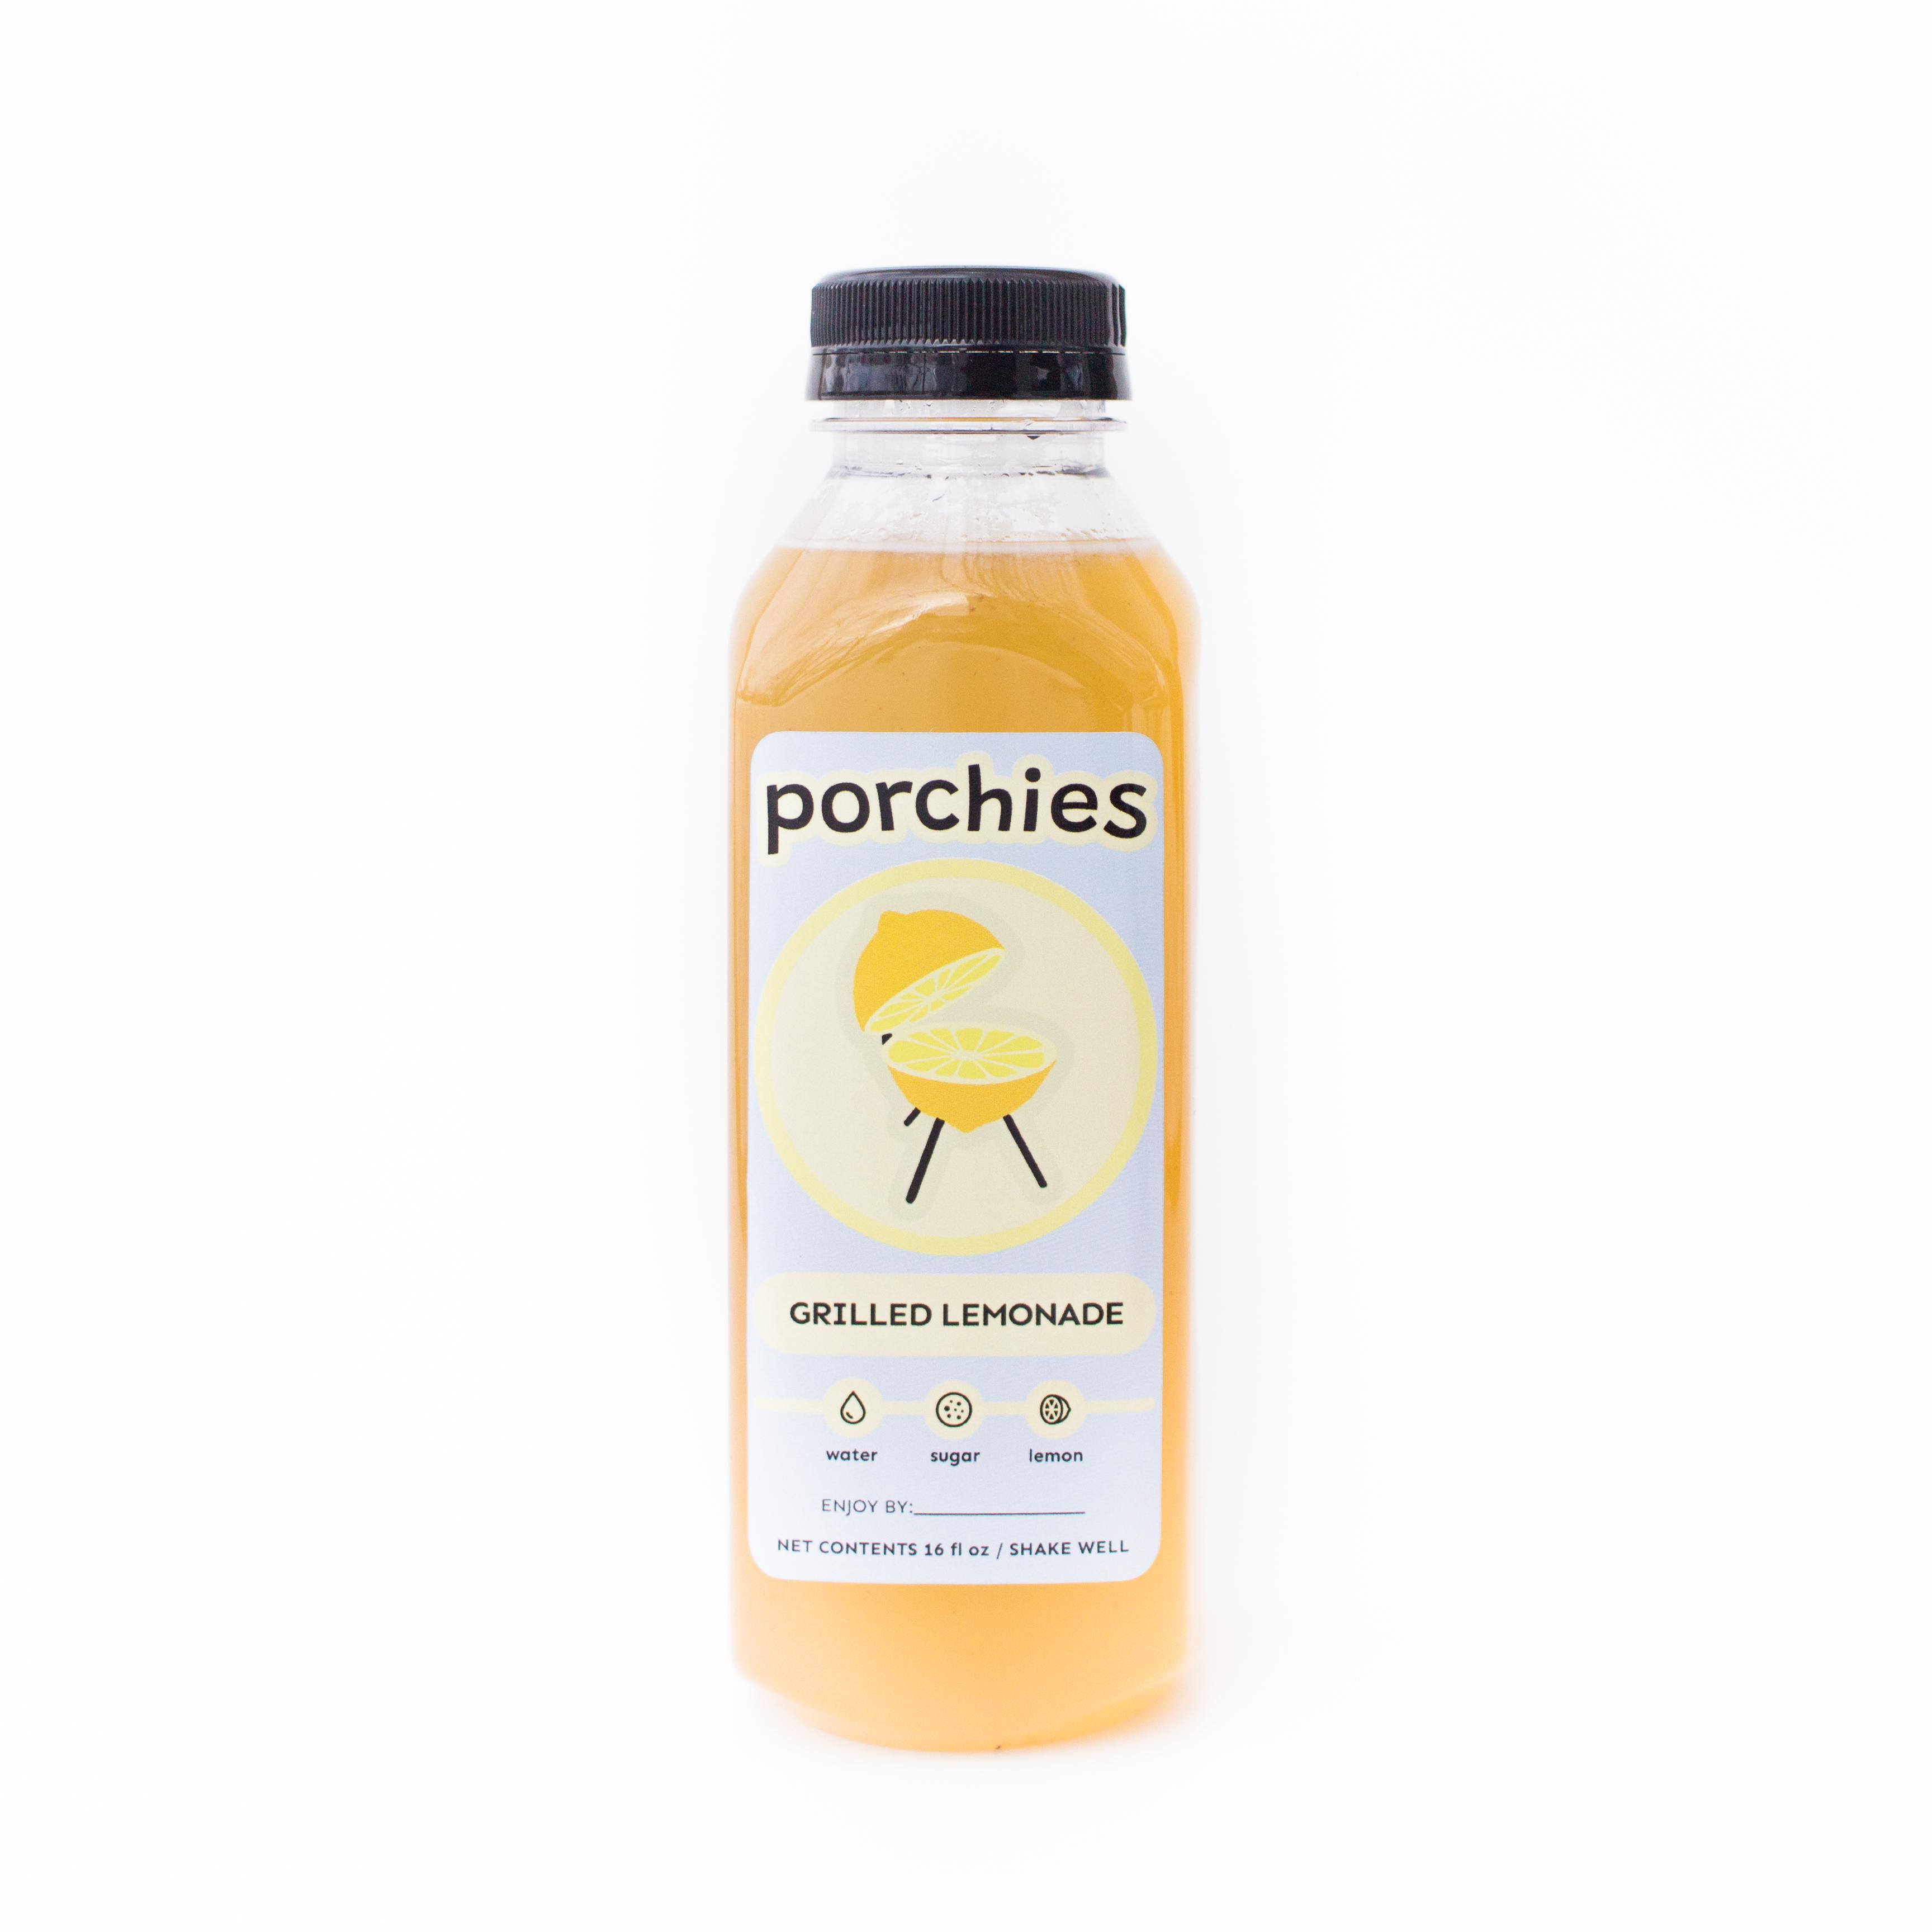 Porchies Original Grilled Lemonade